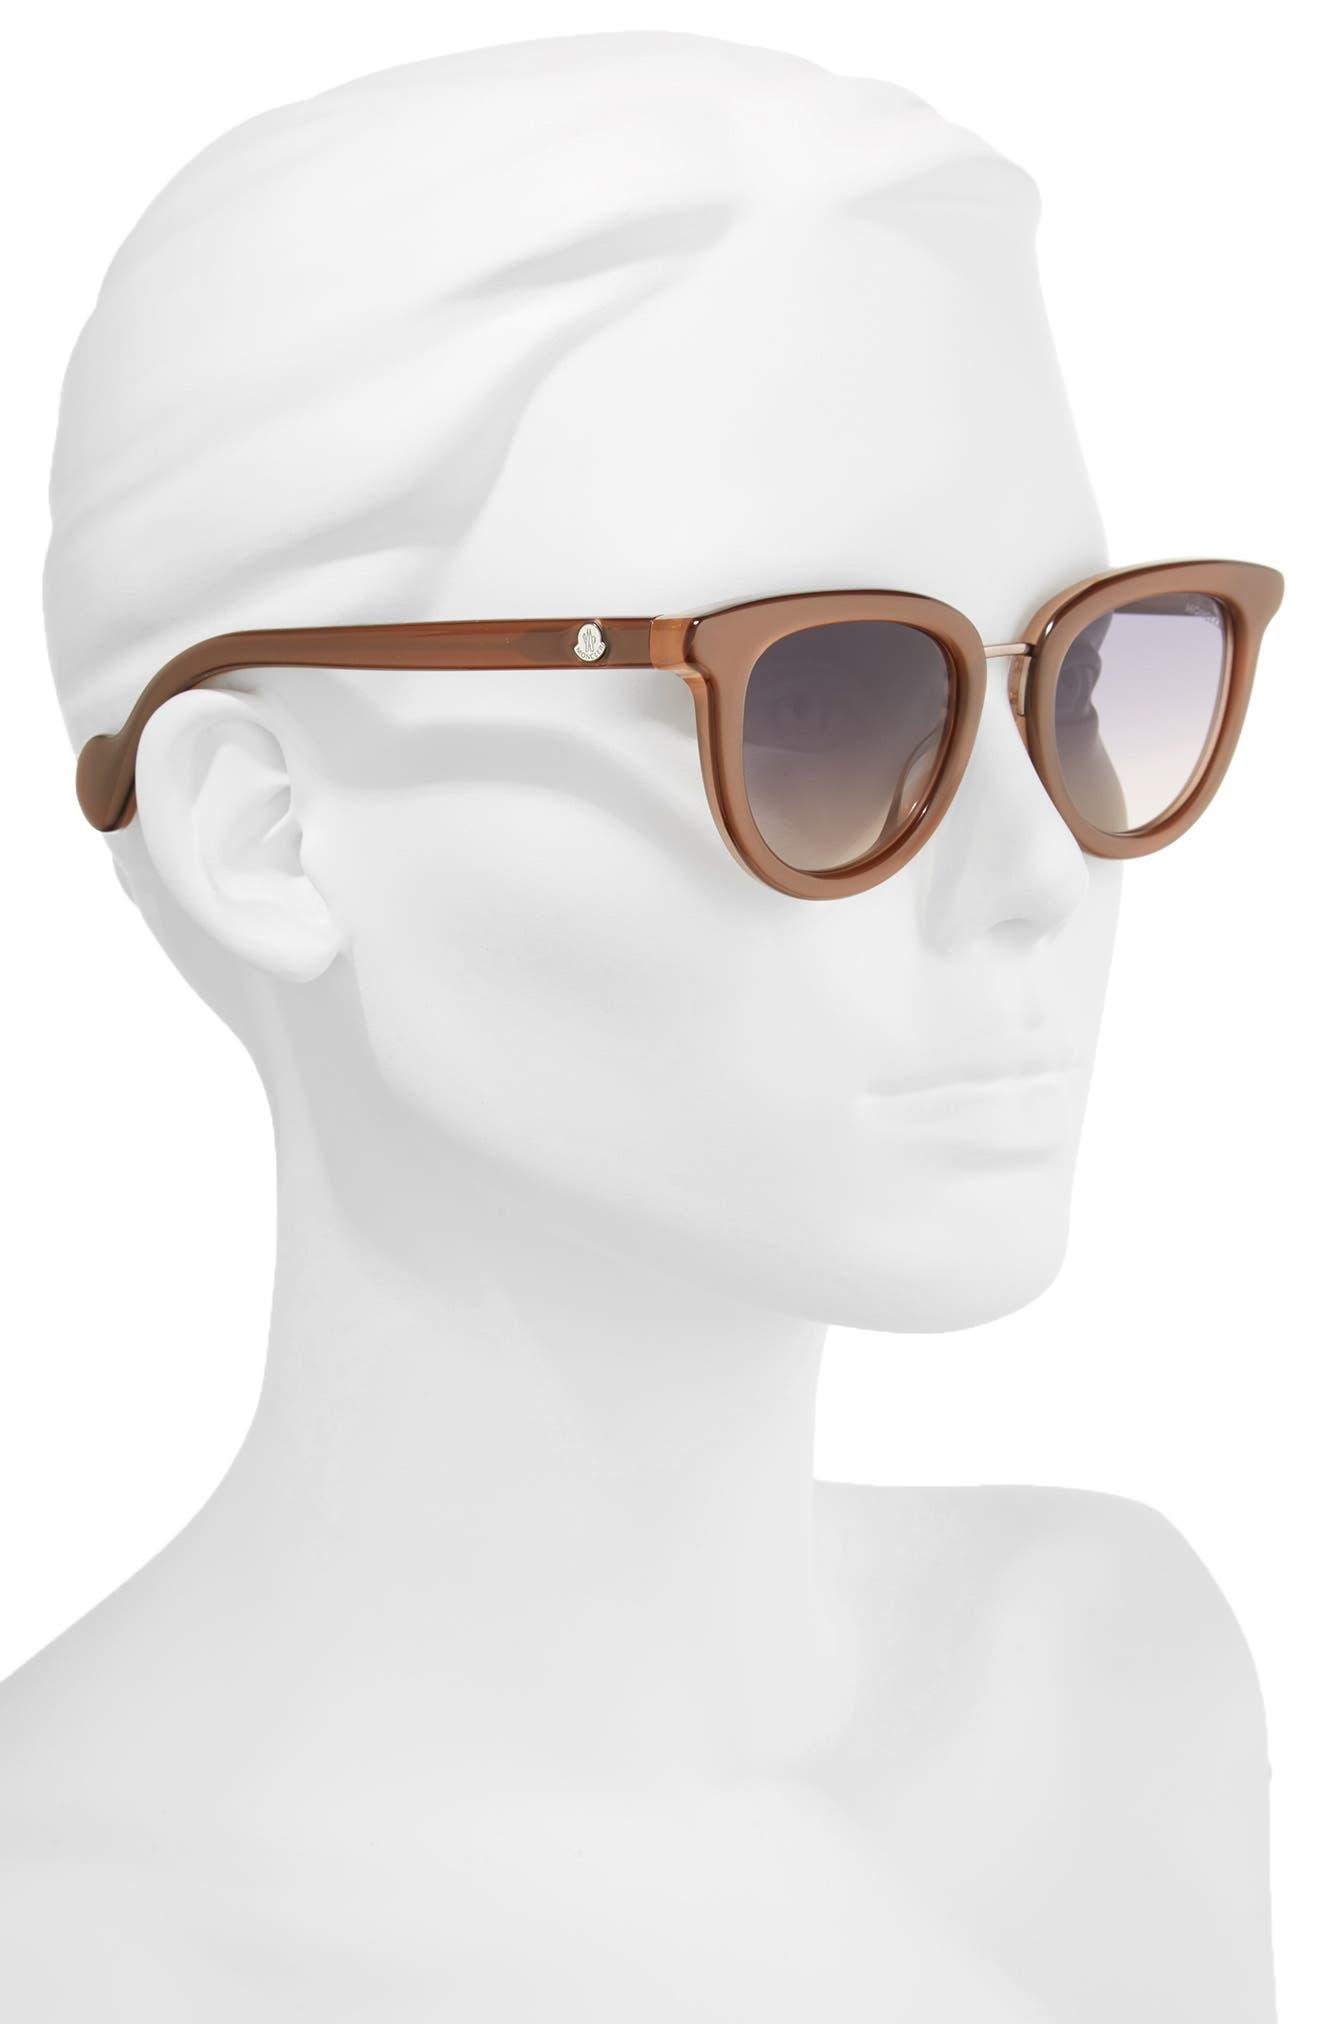 48mm Cat Eye Sunglasses,                             Alternate thumbnail 2, color,                             Pearl Brown/ Grey/ Sand